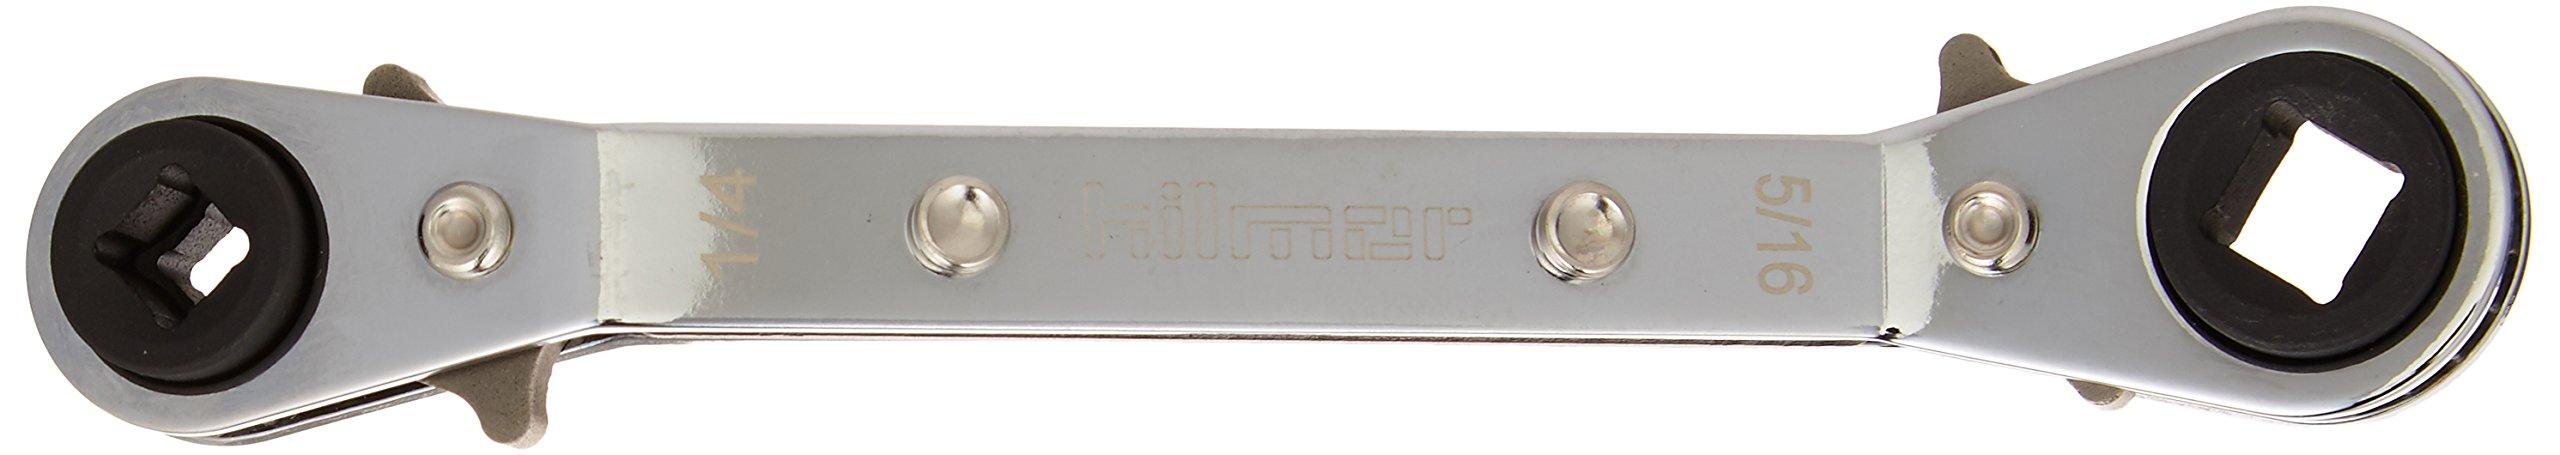 hilmor 1839043 Off Set Service Wrench, 1/4'' x 3/16'' Square, 3/8'' x 5/16'' Square